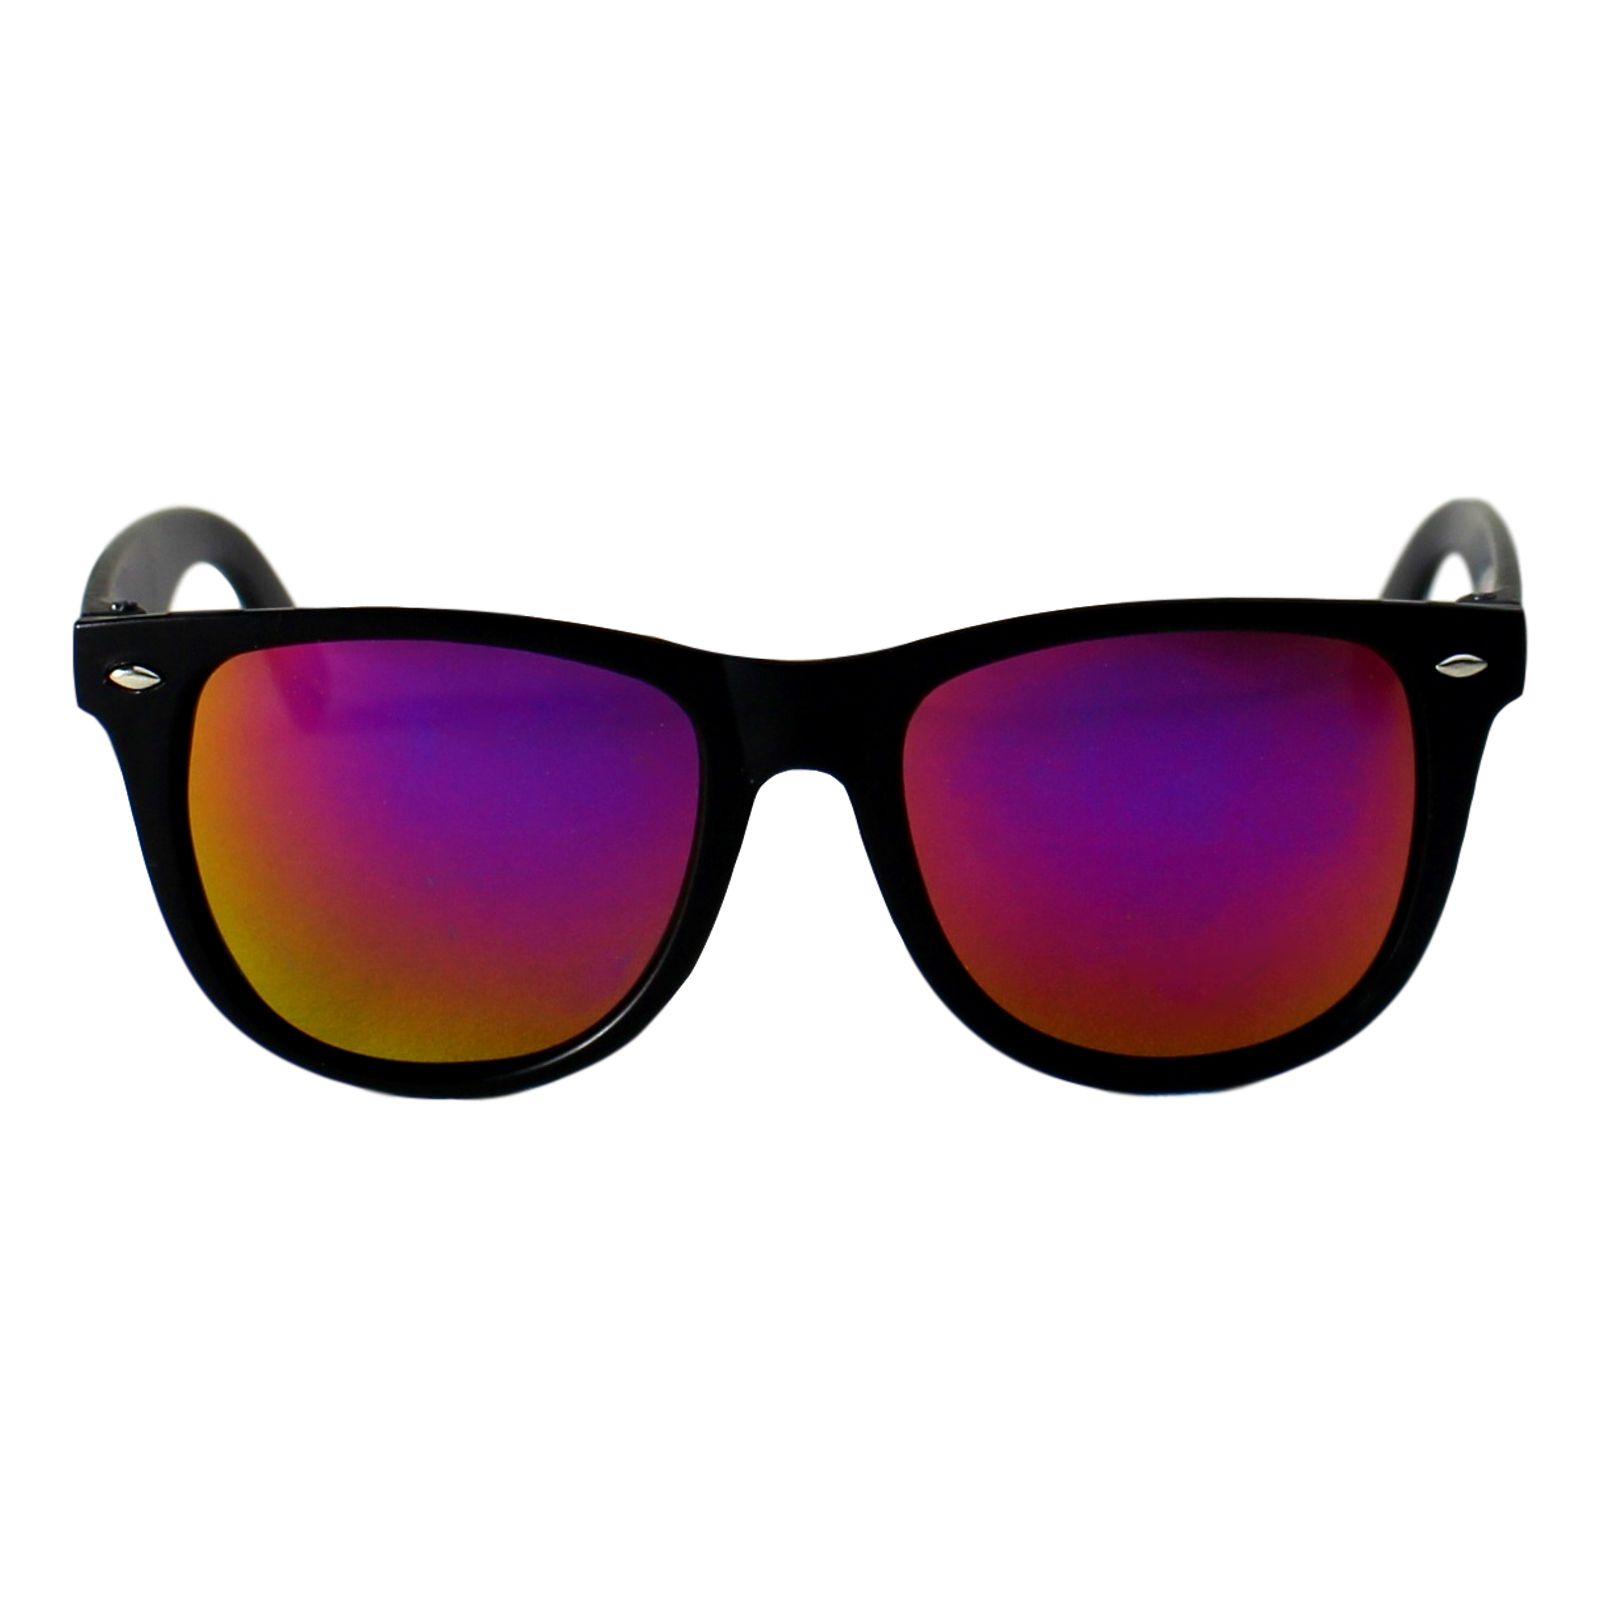 Óculos de Sol Díspar ID1894 infantil -  Pink